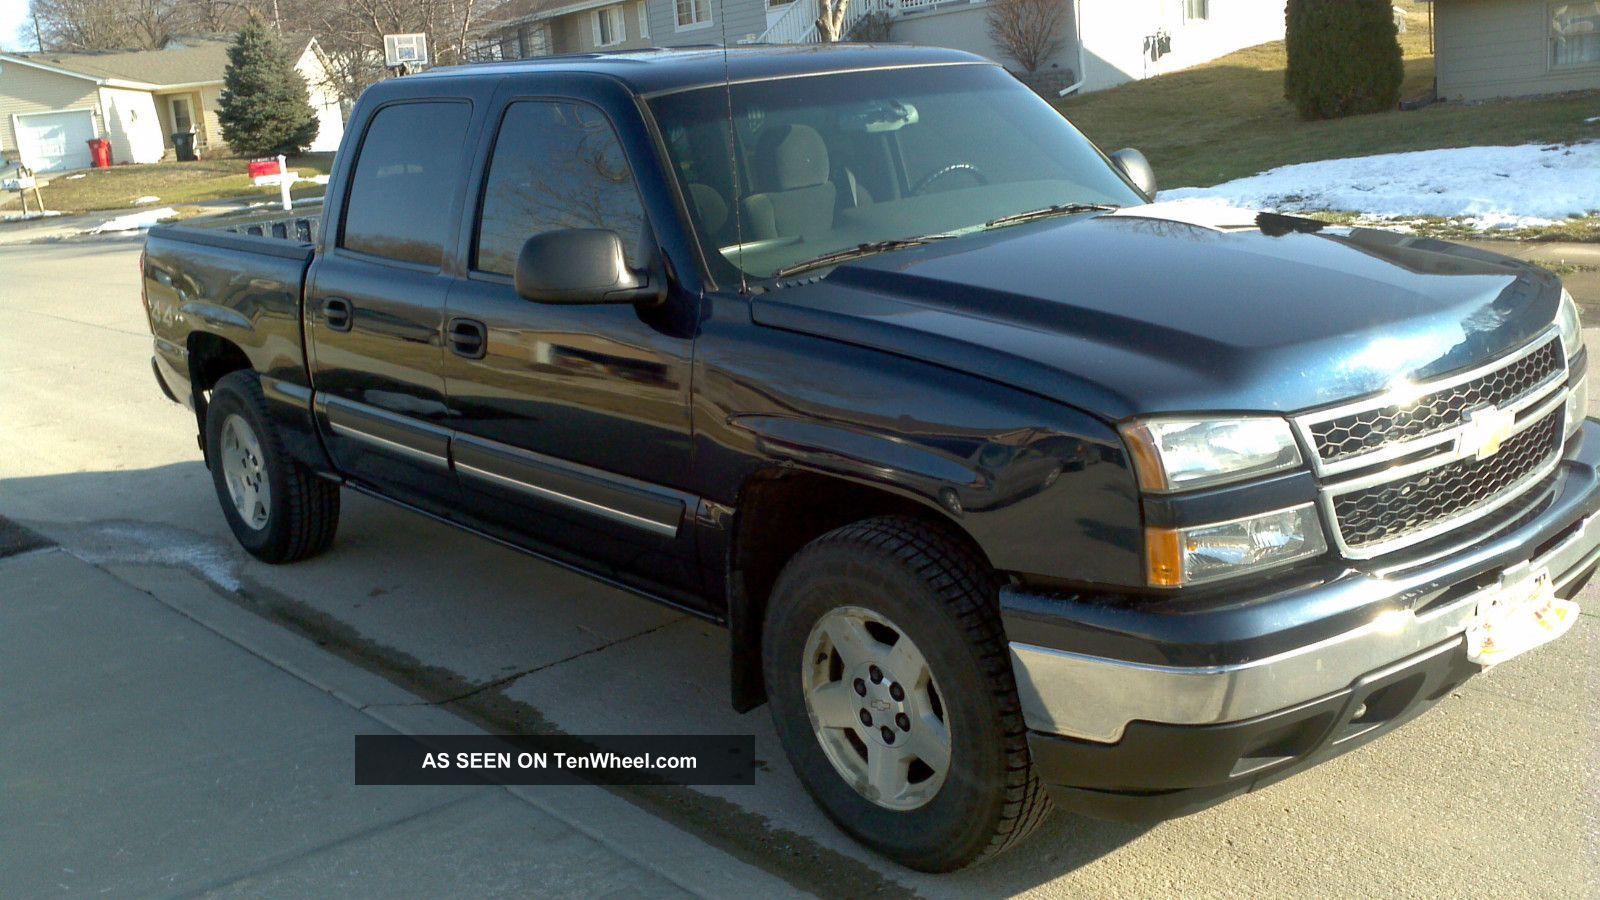 6.0 Powerstroke Specs >> 2007 Chevrolet Silverado 1500 Crew Cab 4x4 Truck